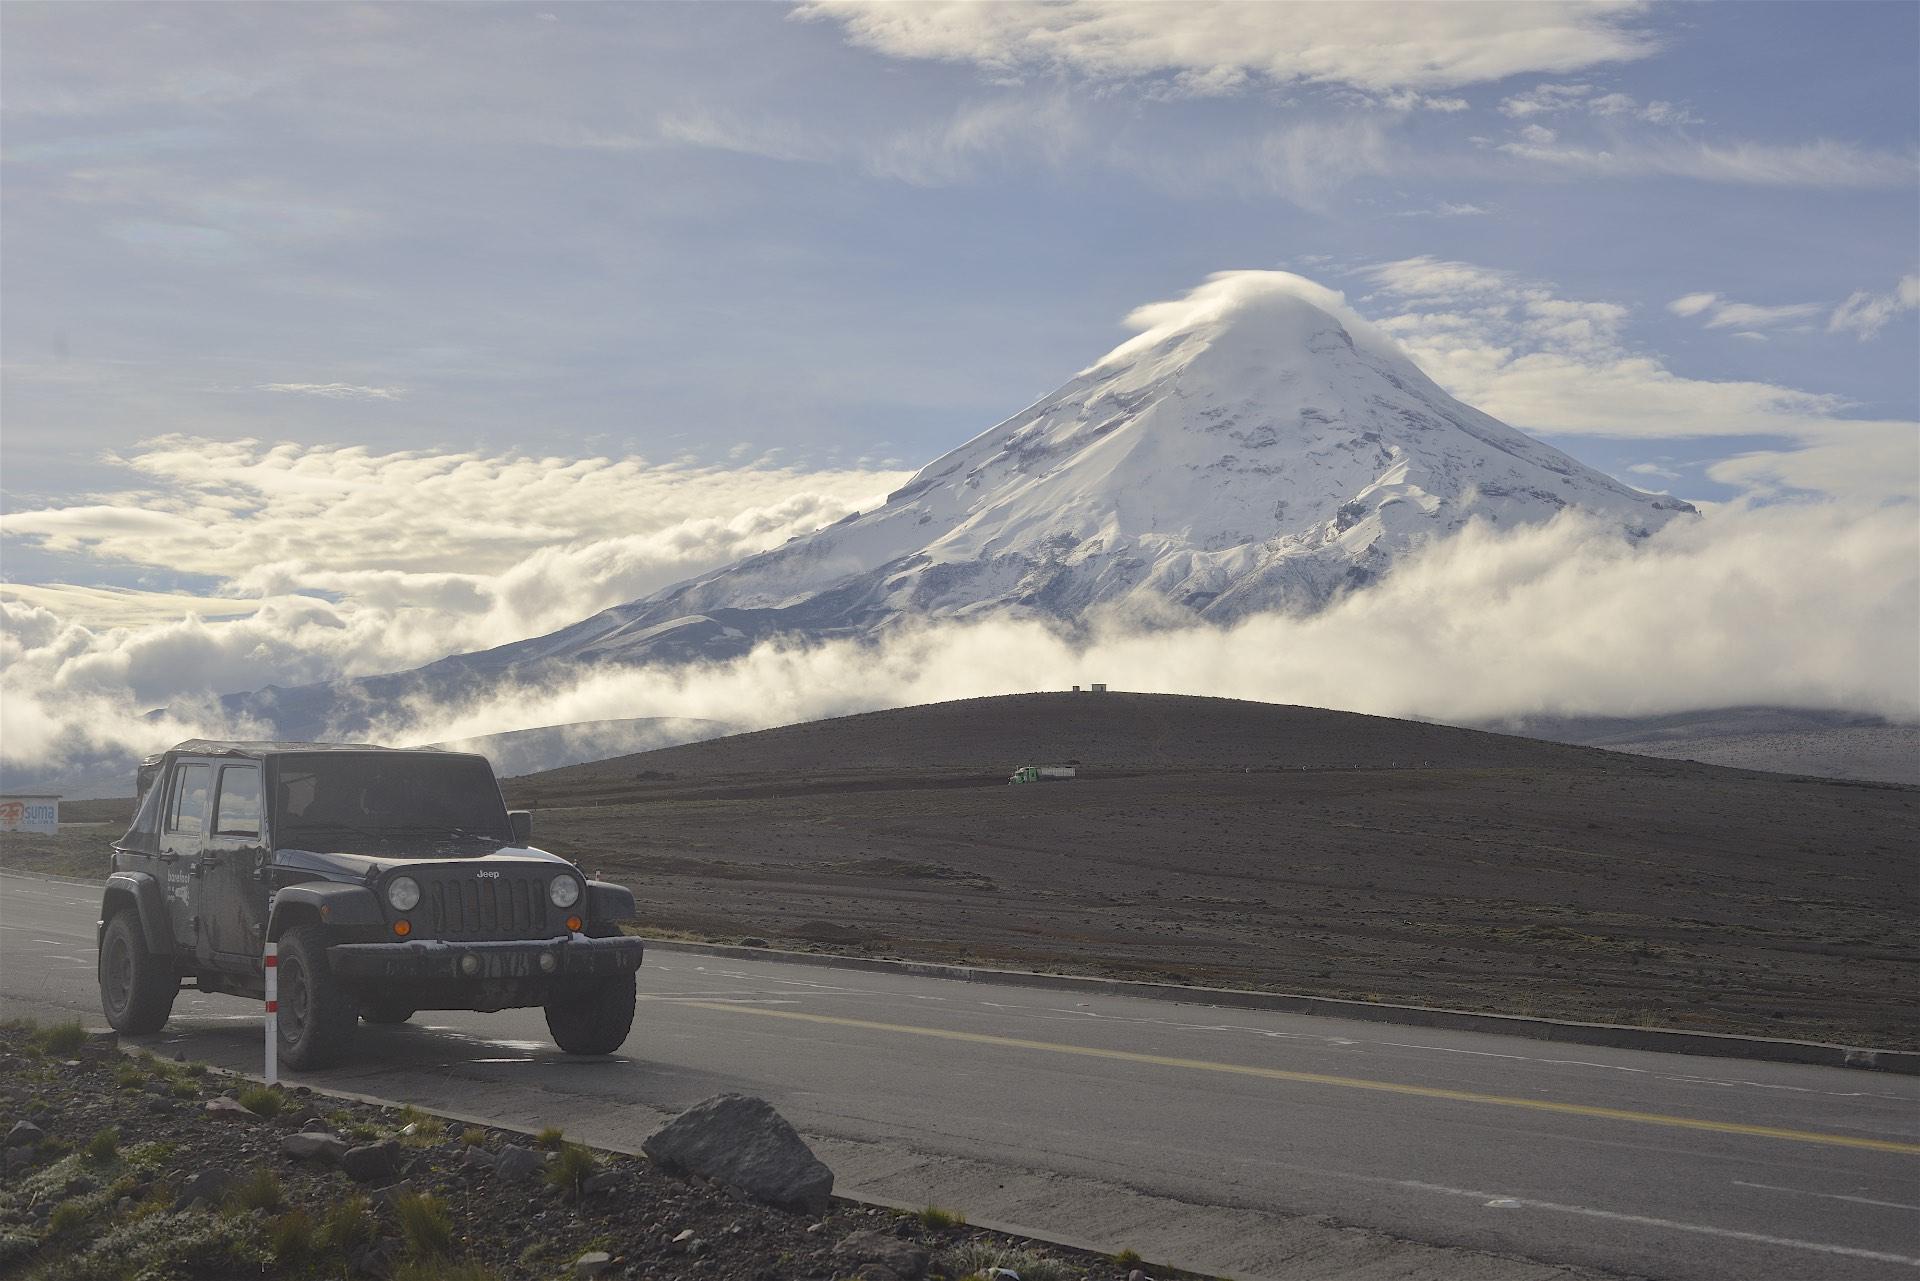 Chimborazo volcano behind the Jeep. 6300 meters.